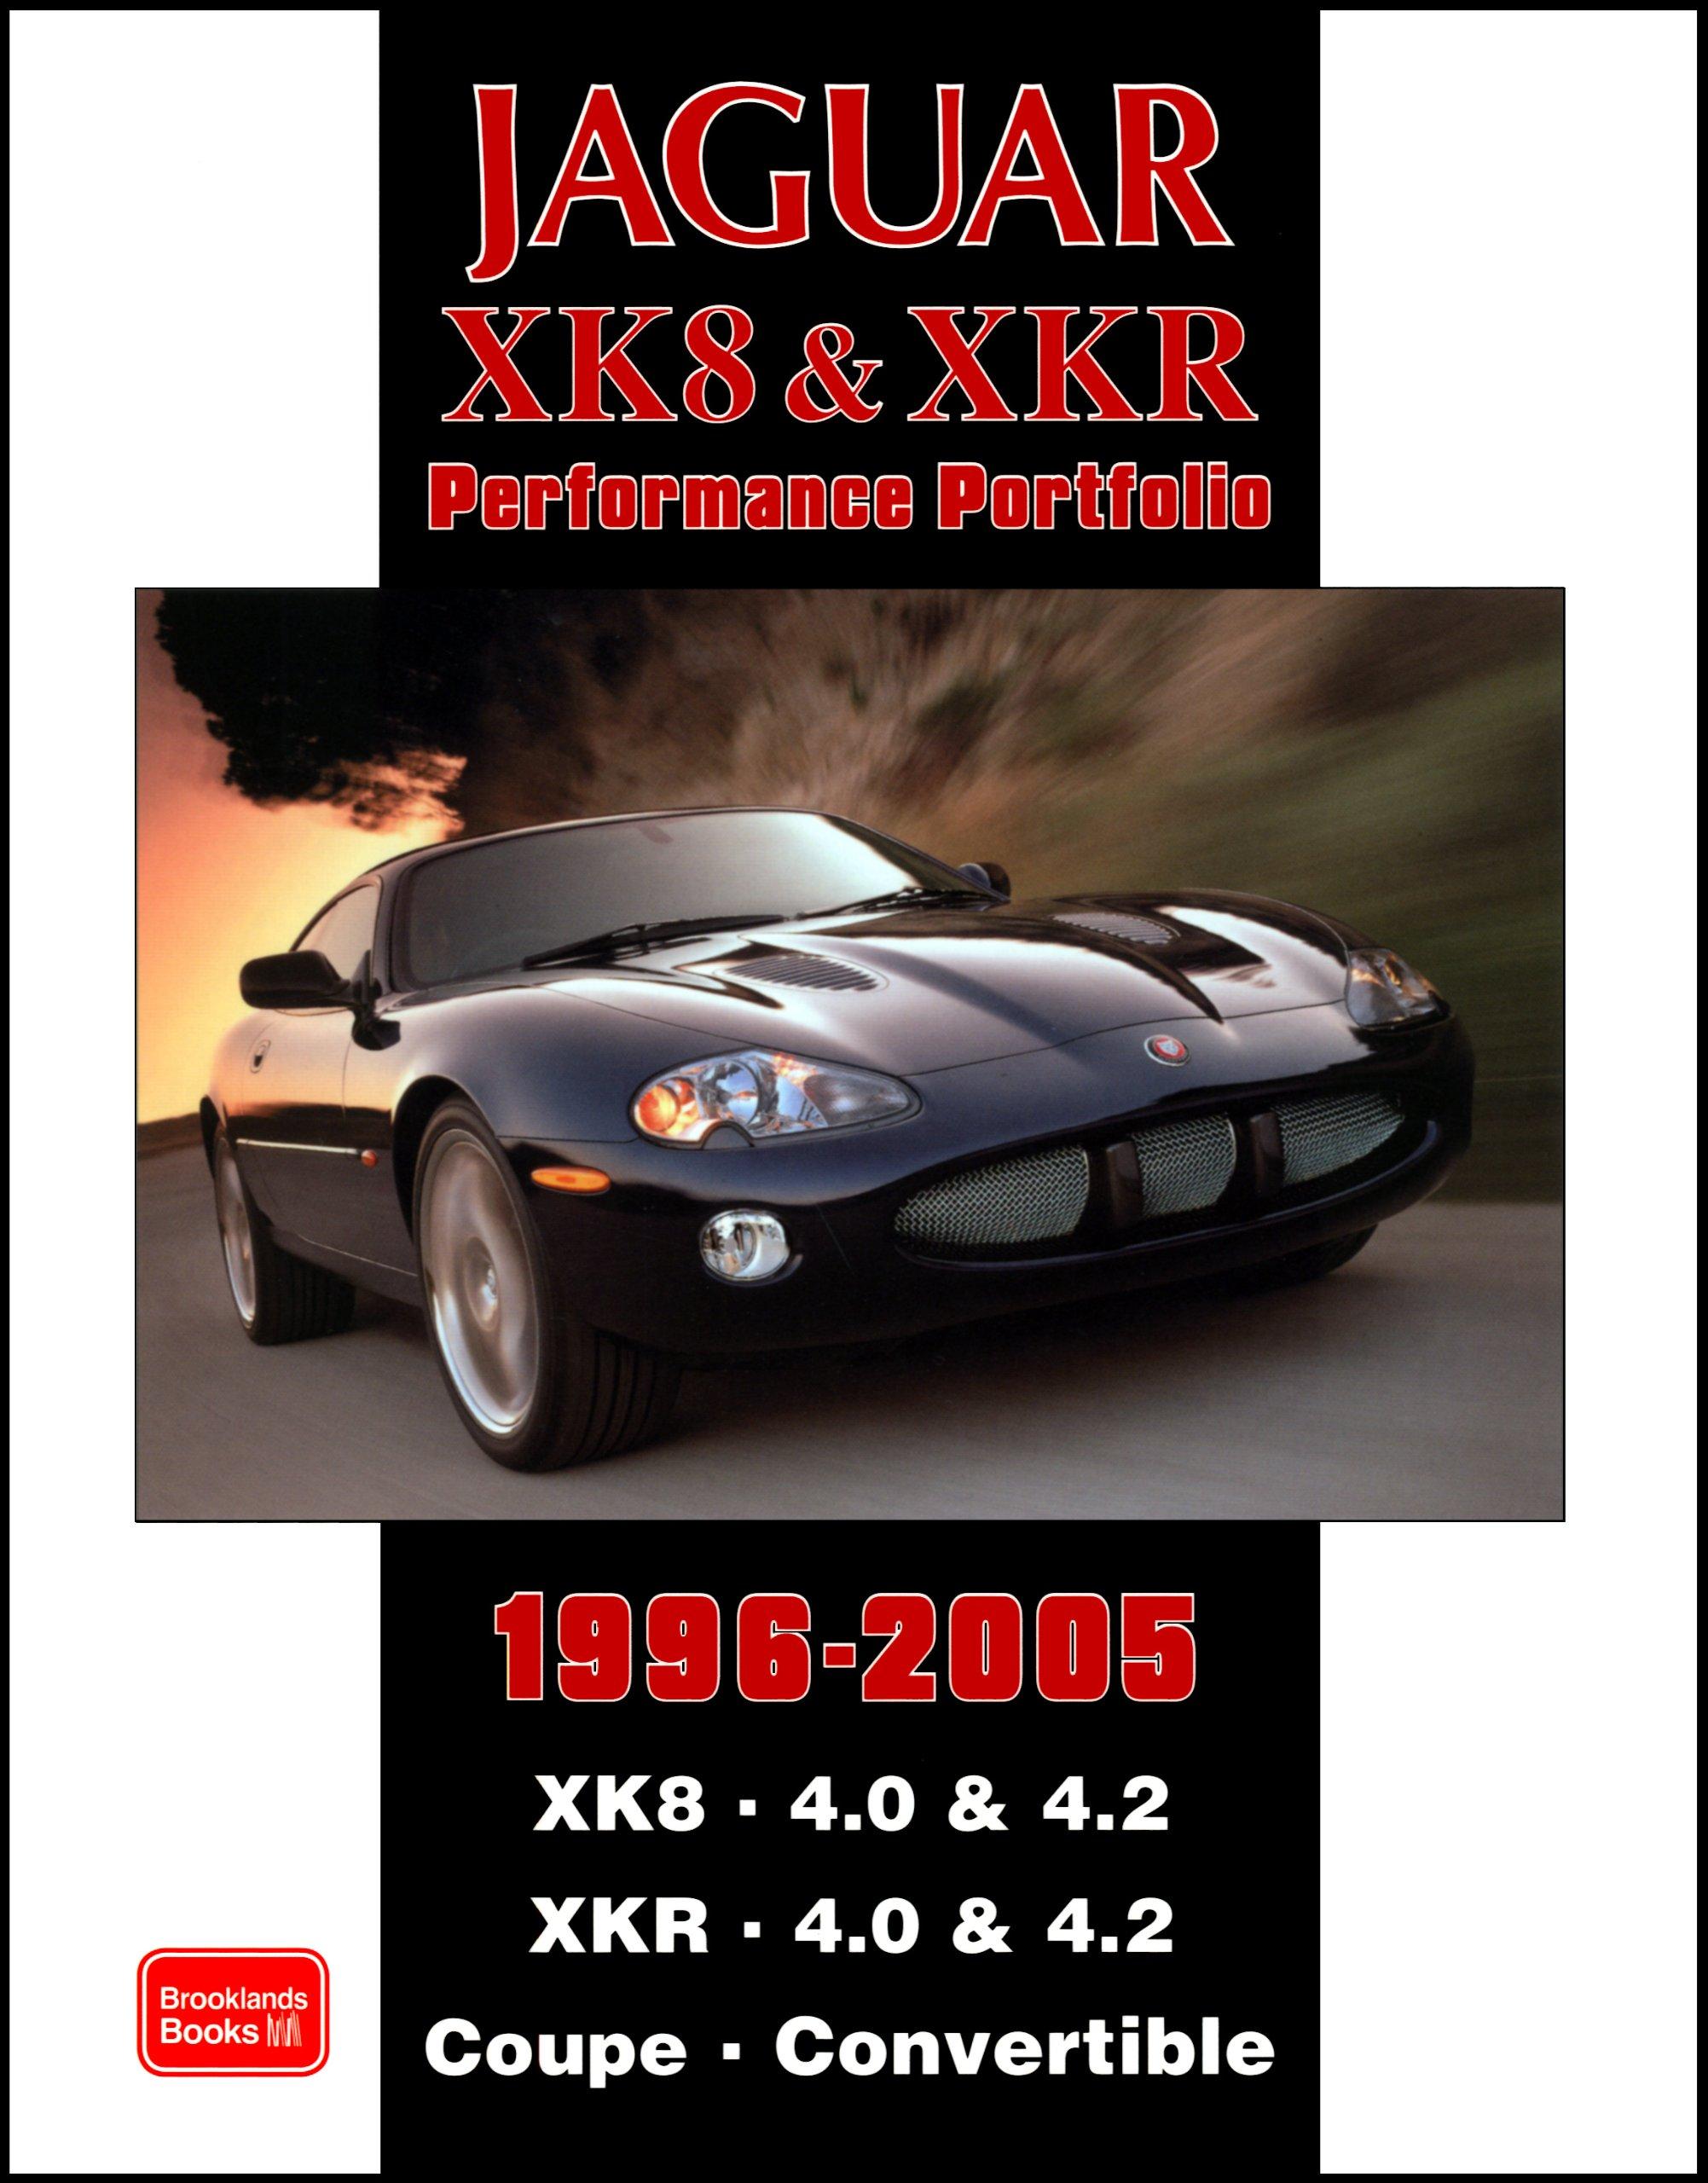 Jaguar XK8 and XKR Performace Portfolio 1996-2005: XK8. 4.0 & 4.2 XKR. 4.0 and 4.2 Coupe. Convertible Performance Portfolio: Amazon.es: R. M. Clarke: Libros ...